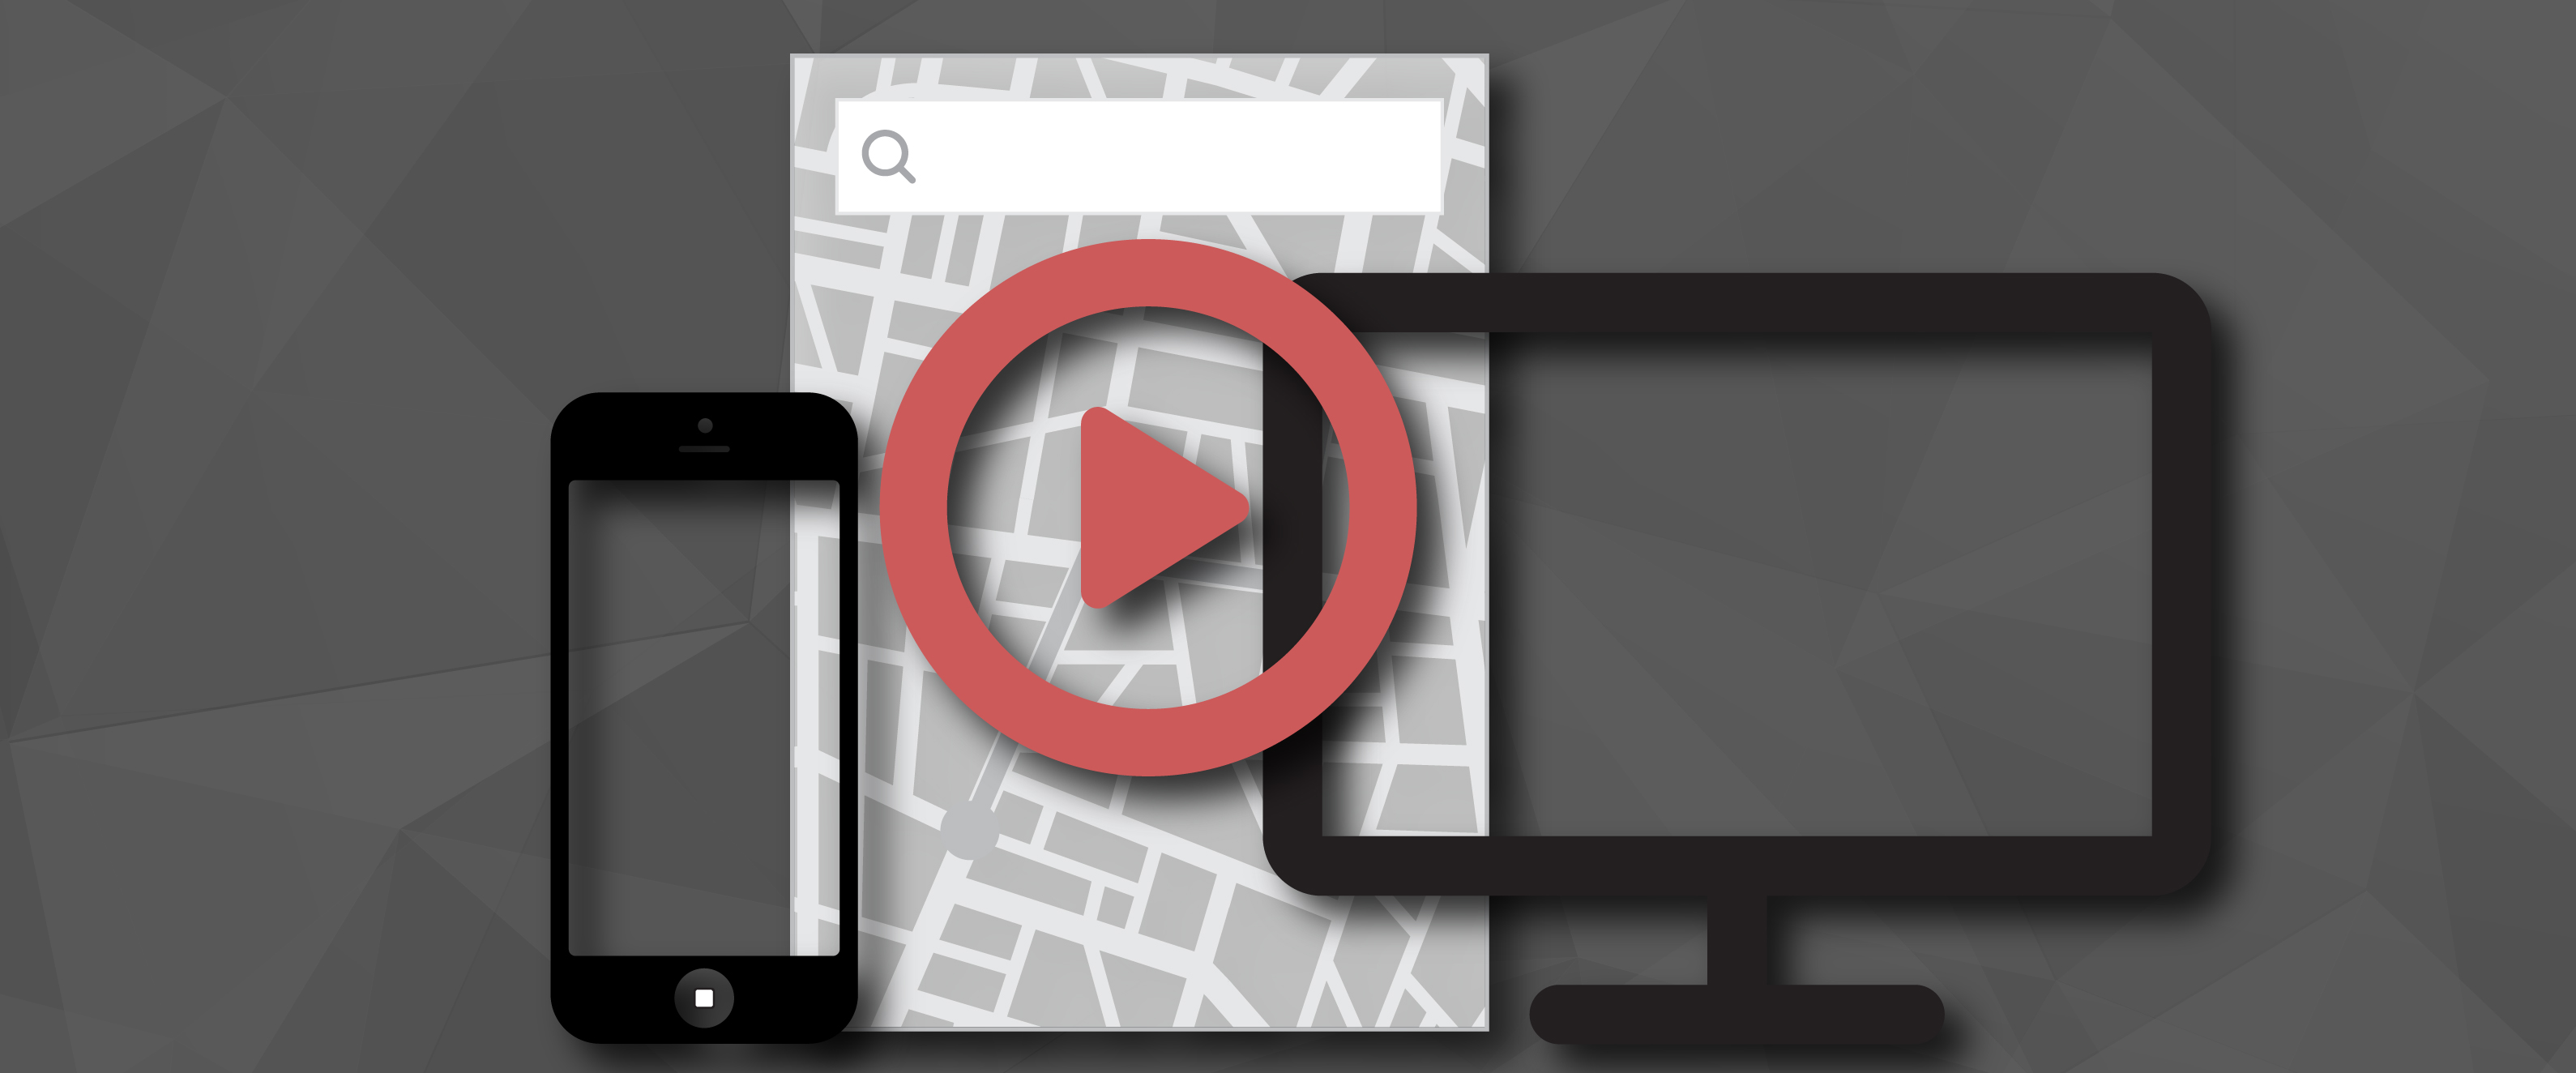 Meet WolfNet's Responsive IDX Property Search [VIDEO]